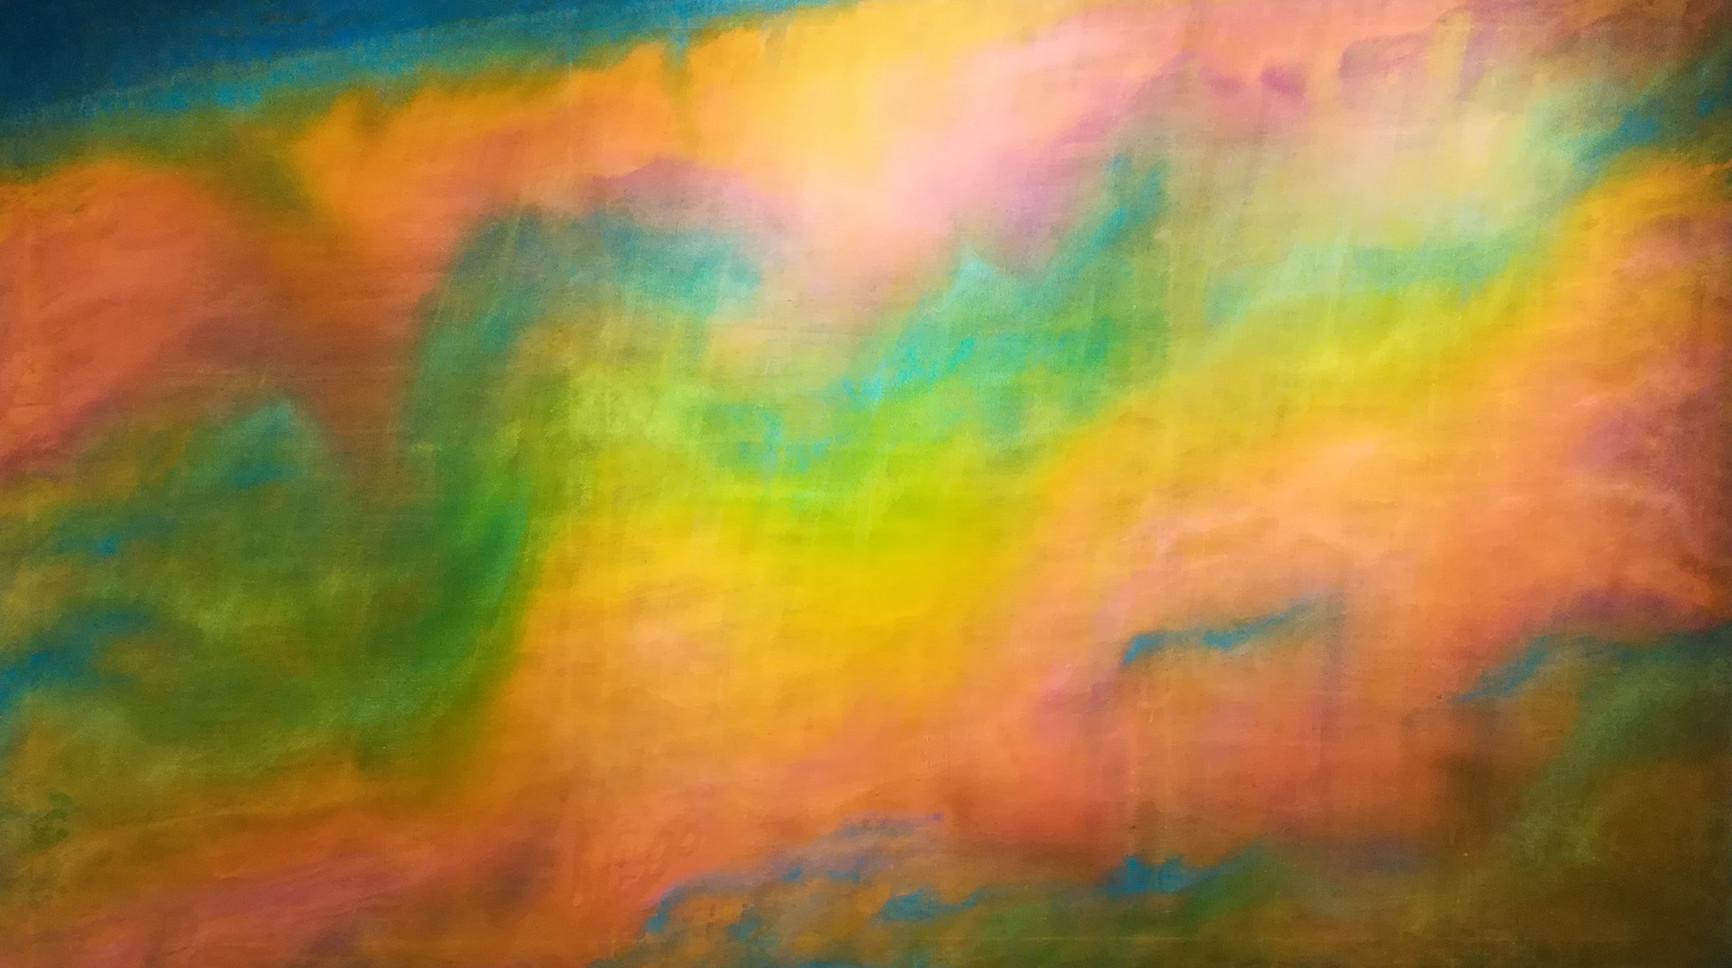 IDEA EARTH In rainbow 観想地球虹の中